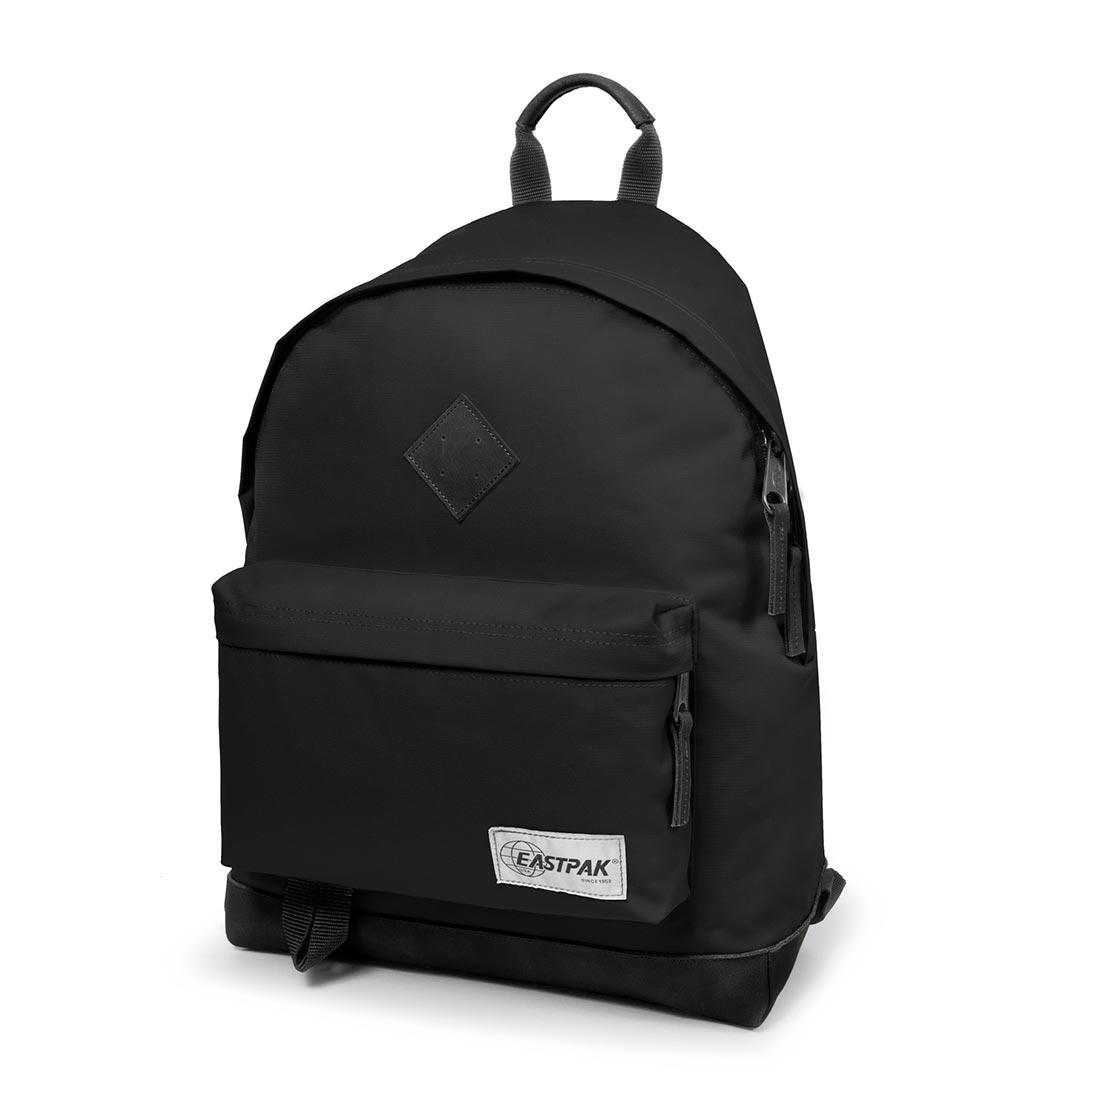 246e05400 Eastpak Wyoming Backpack - Into Mono Black